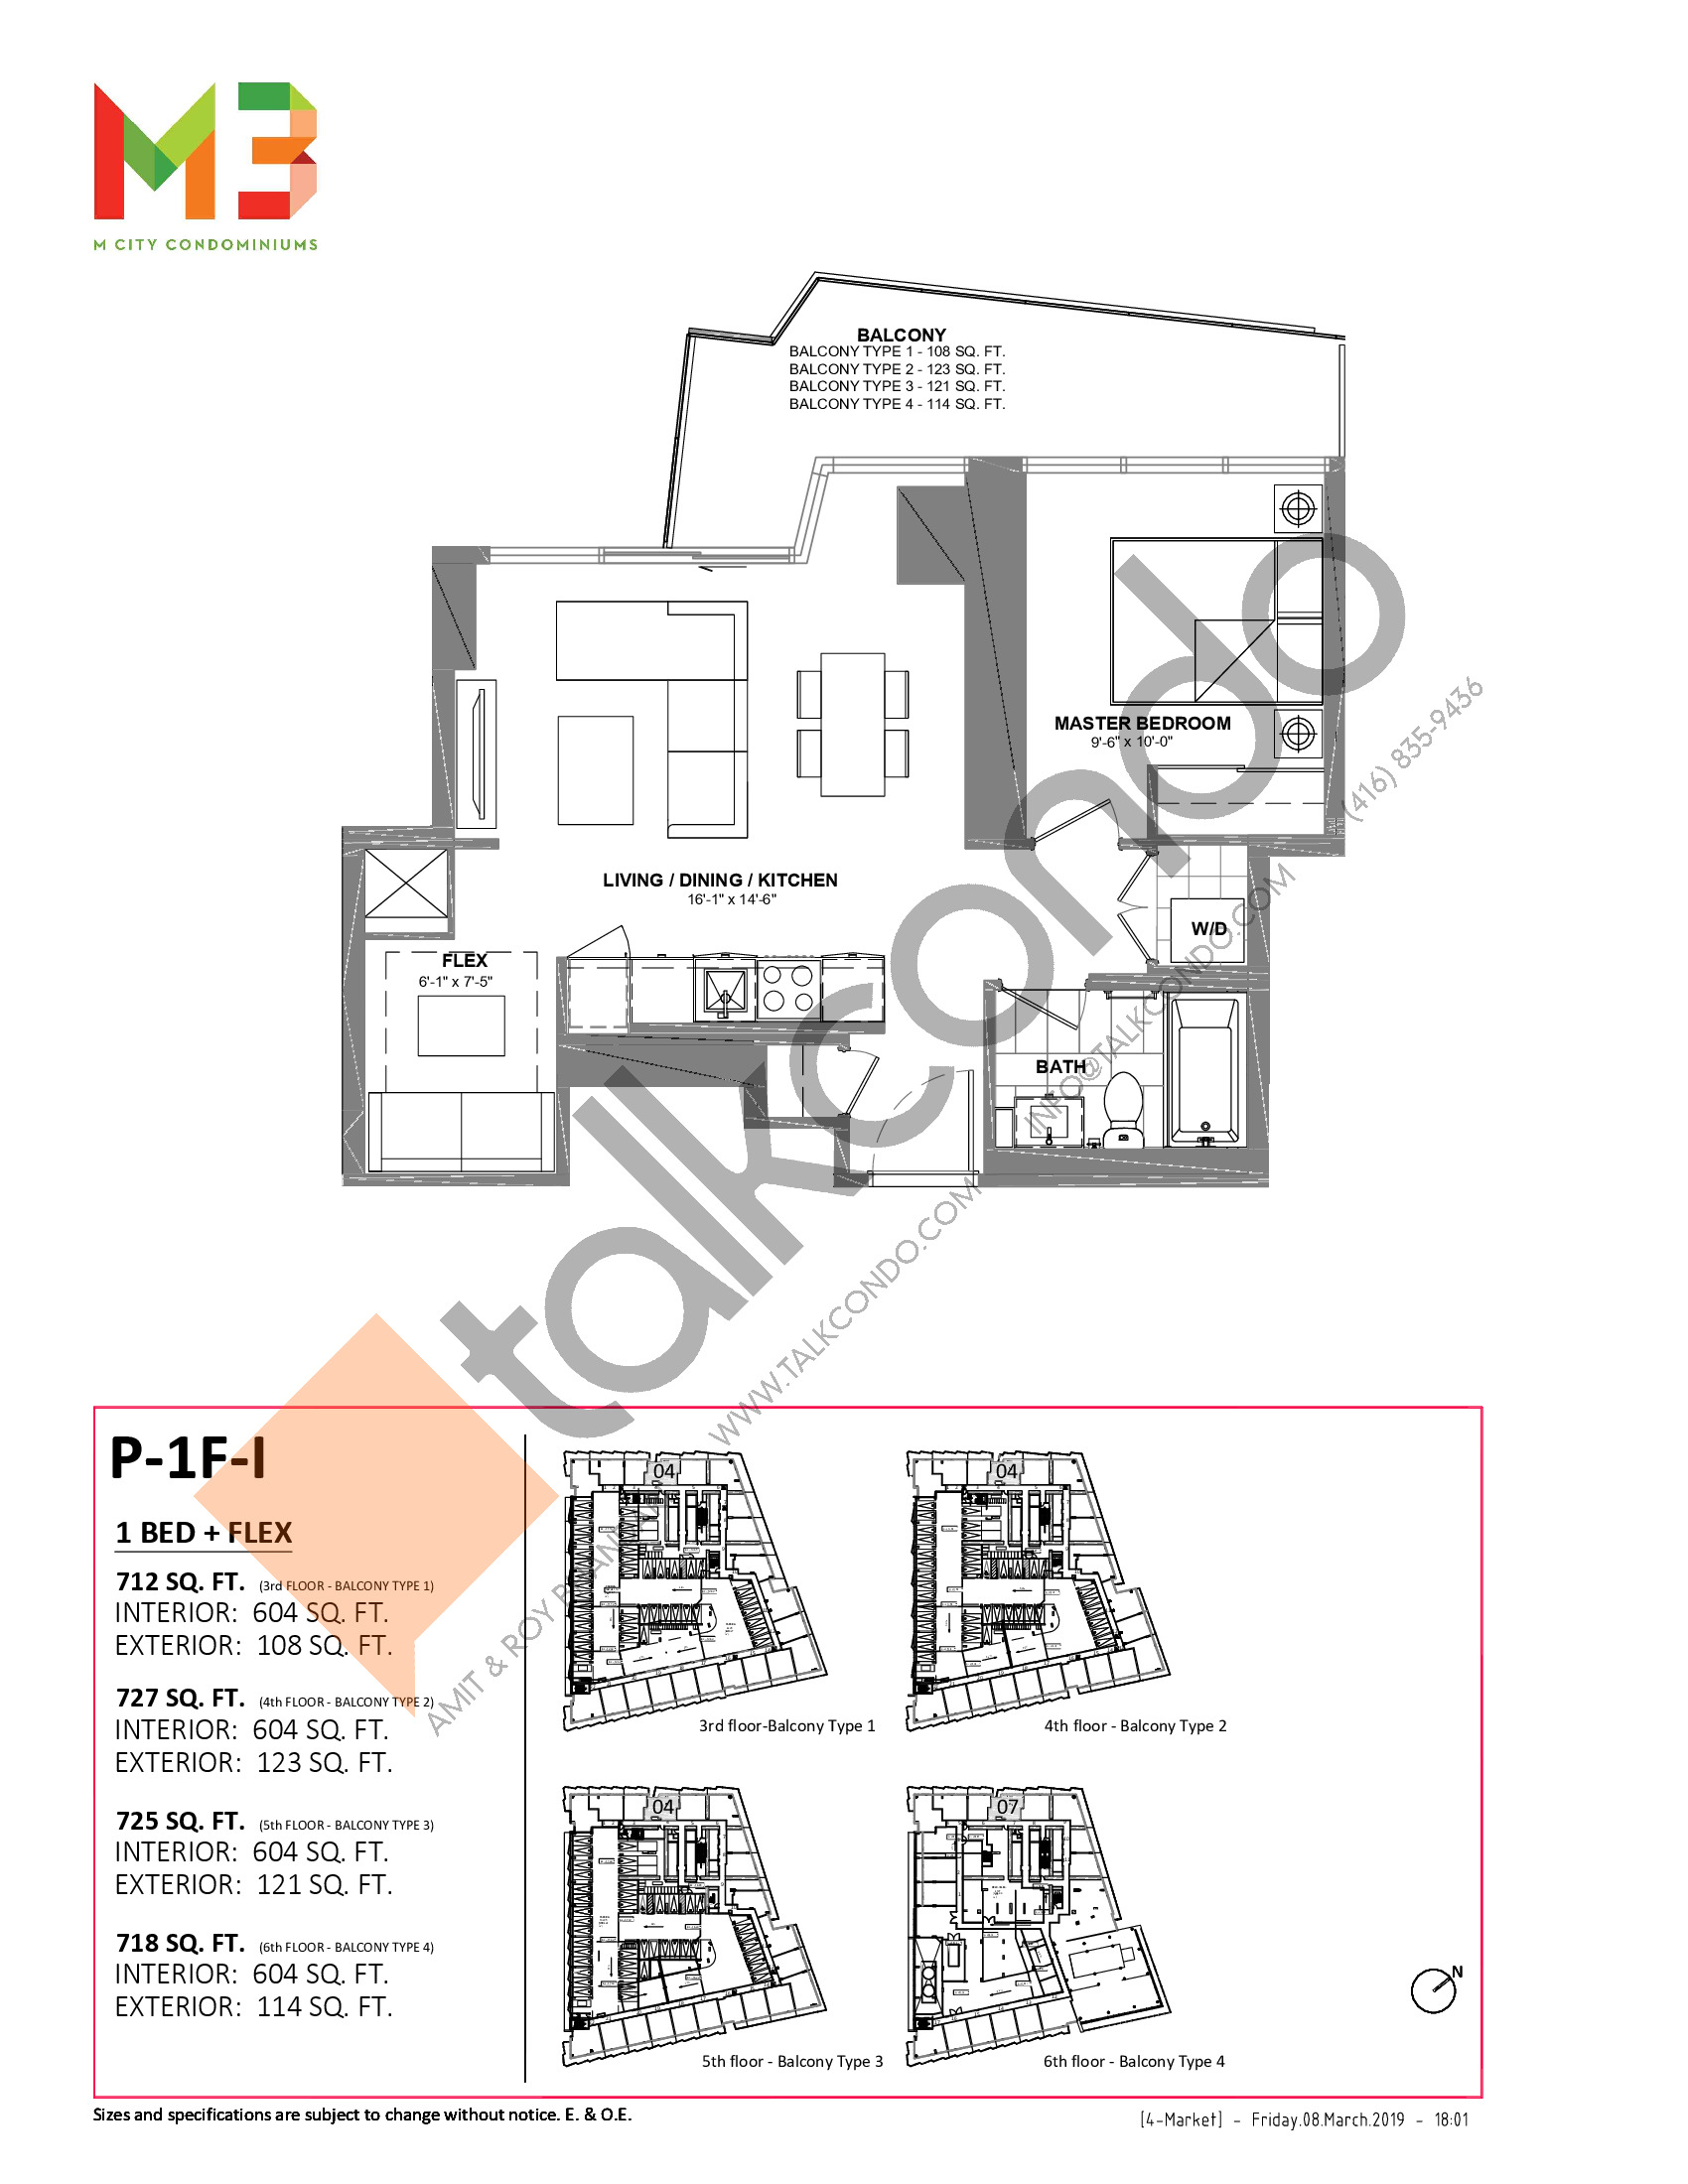 P-1F-I Floor Plan at M3 Condos - 604 sq.ft